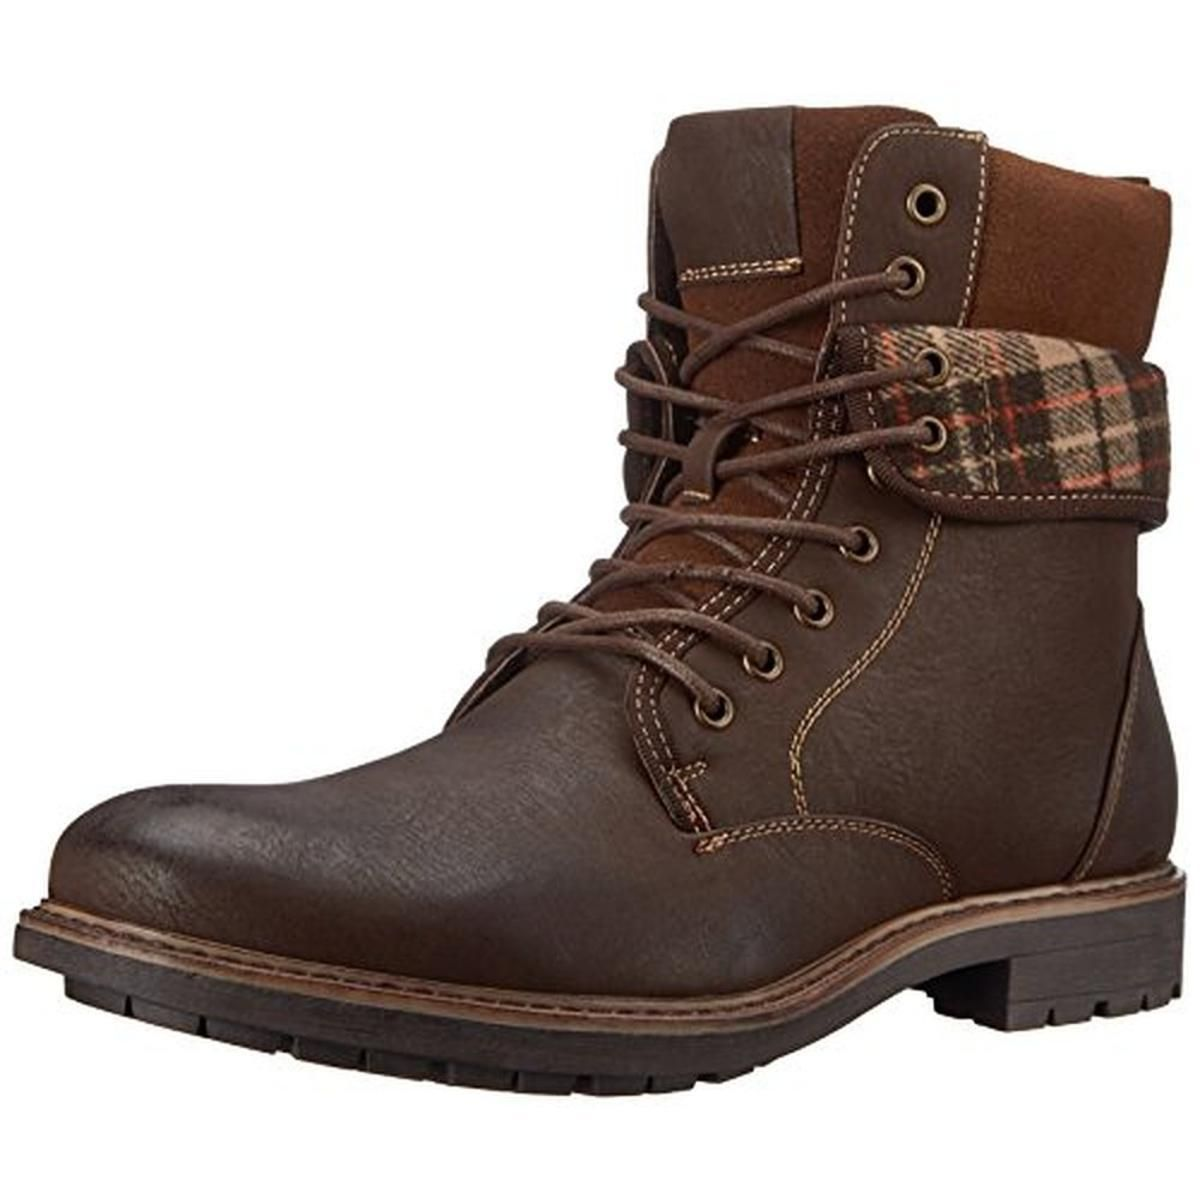 Madden 2034 Mens M-Neptun Brown Fold-Over Combat Boots Shoes 10 Medium (